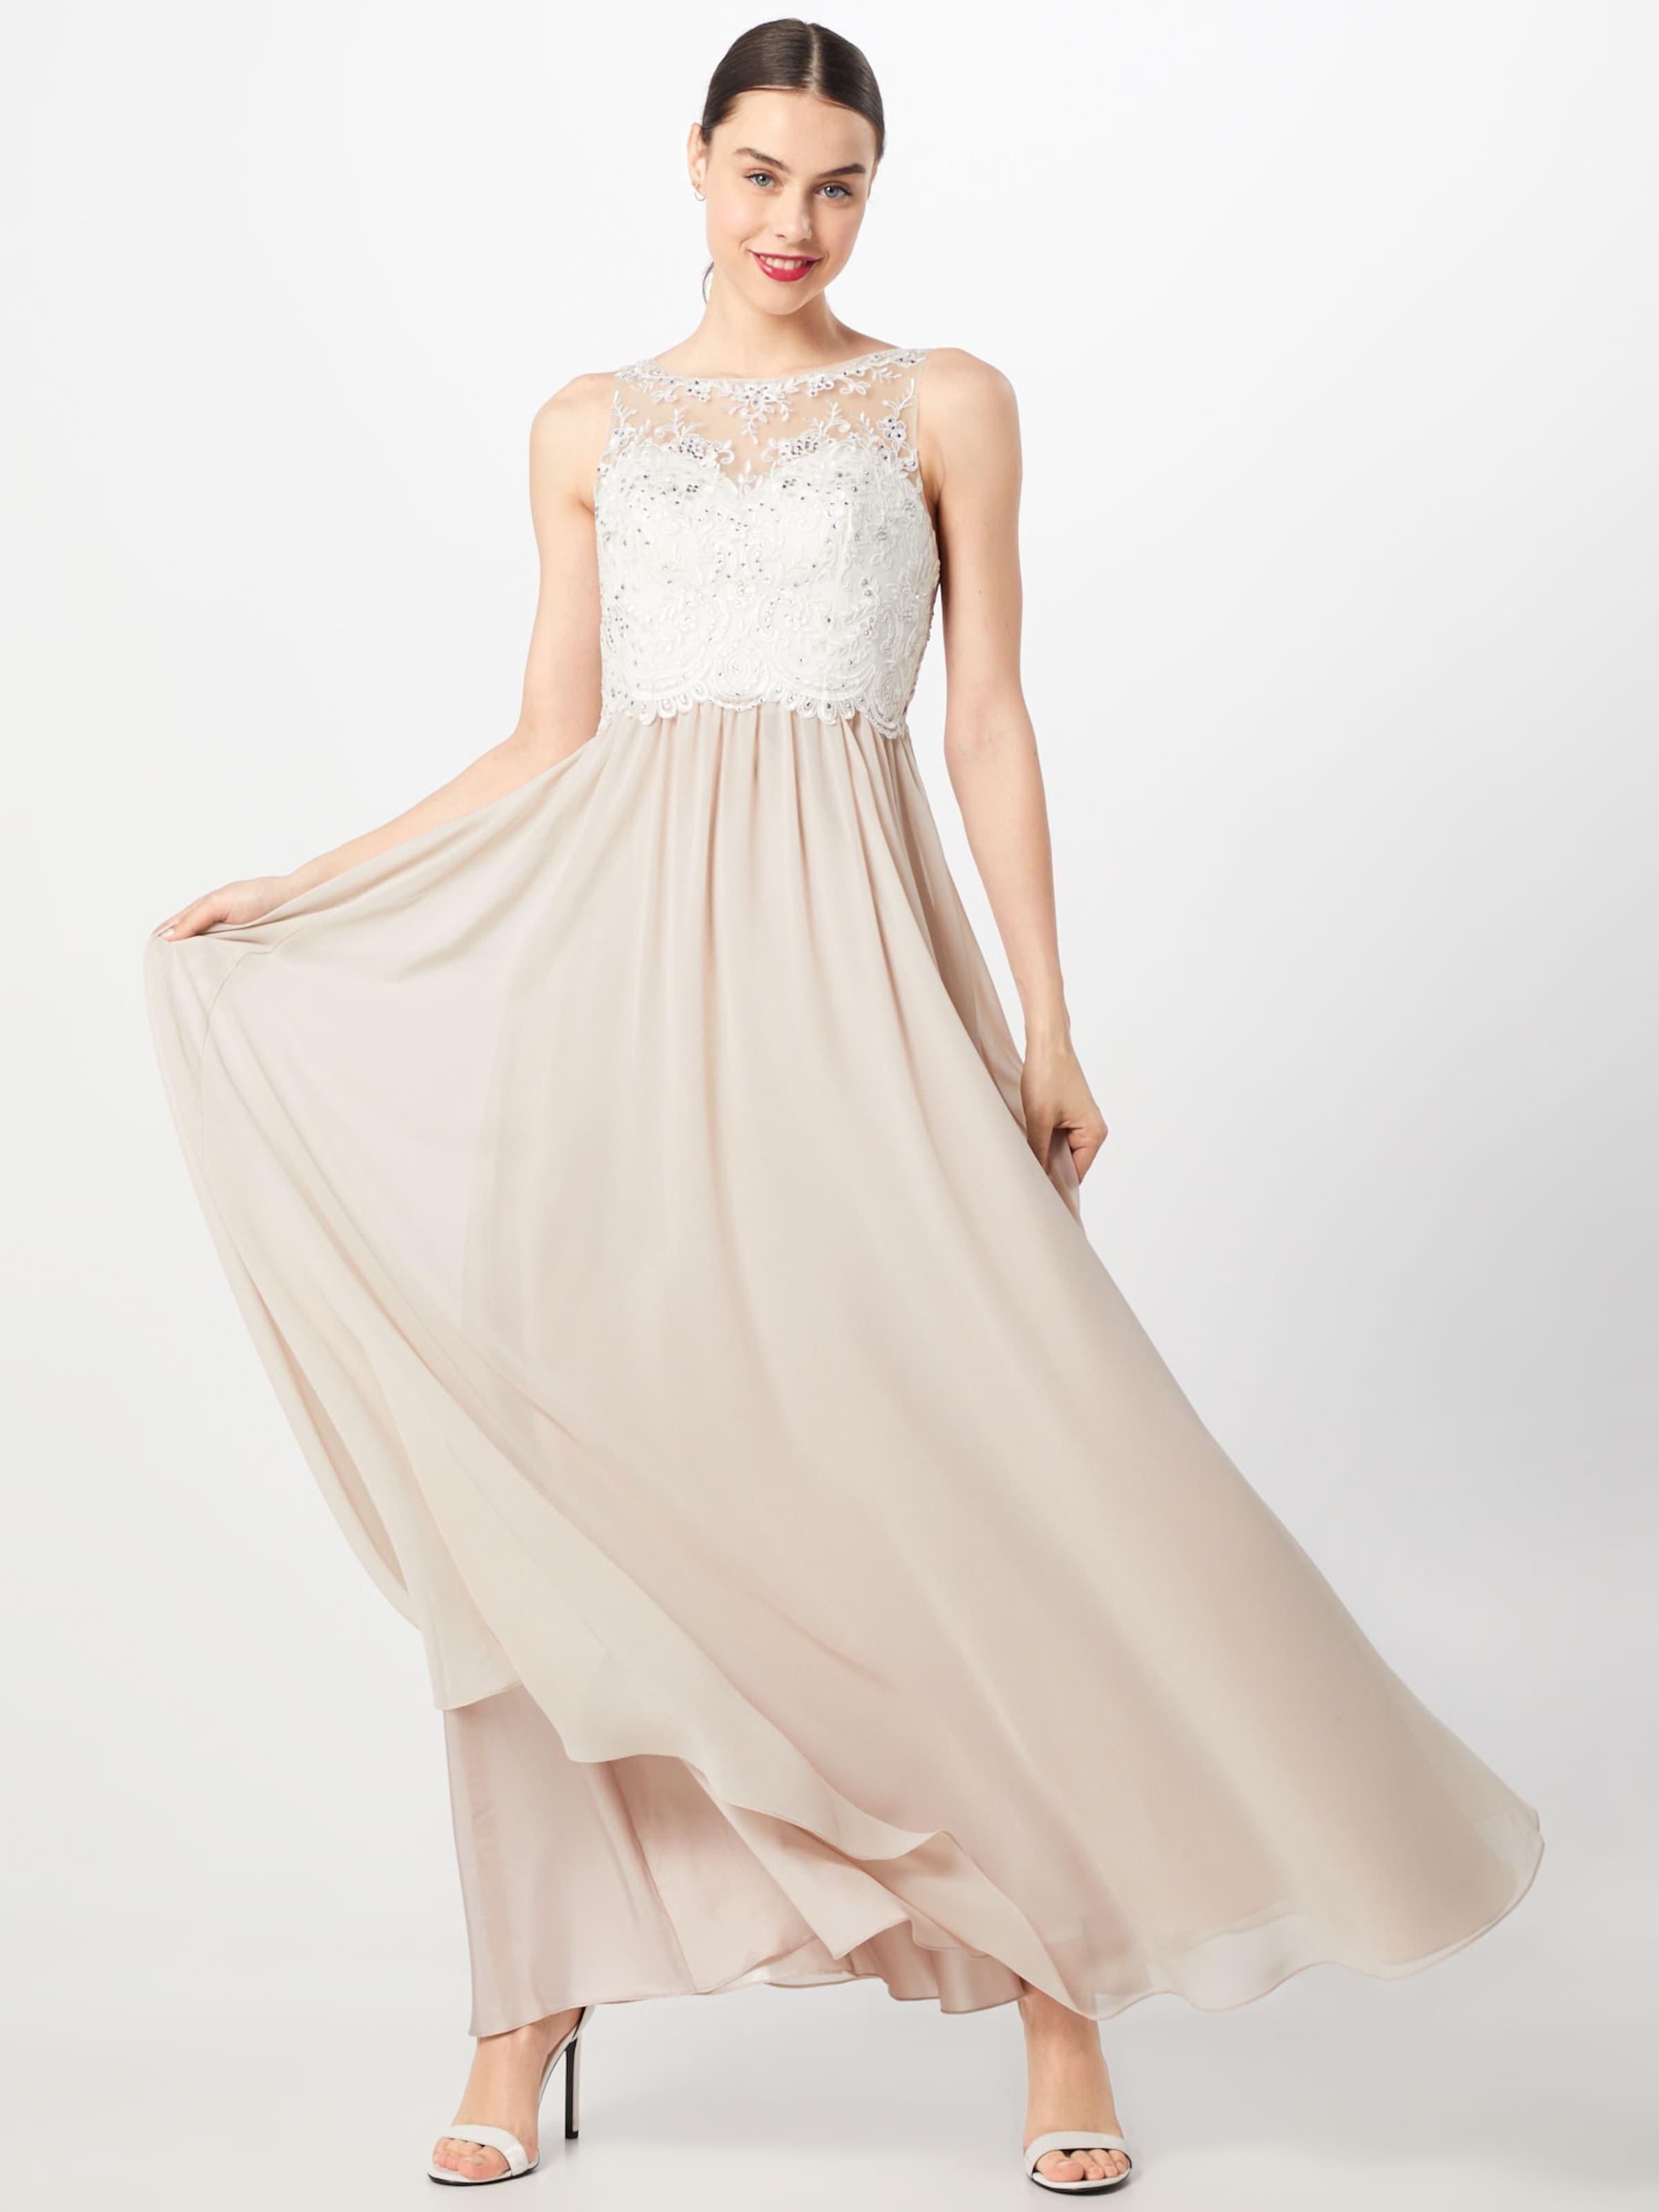 Perle Robe De Laona Soirée En CrèmeBlanc XwTlukZiOP